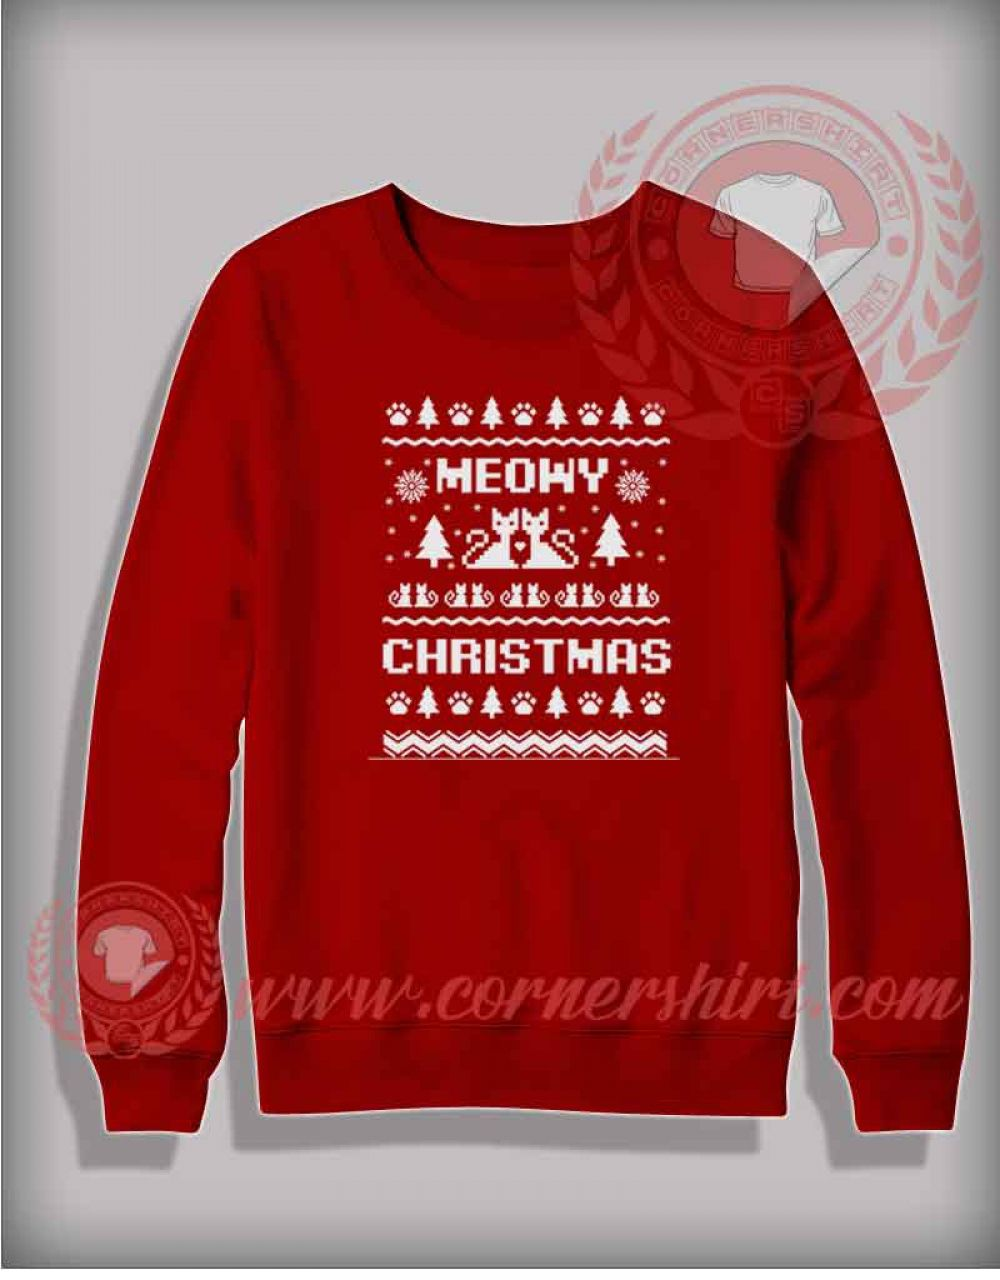 Fotos Cena Navidad Frinsa.Meowy Christmas Sweatshirt Funny Christmas Gifts For Friends